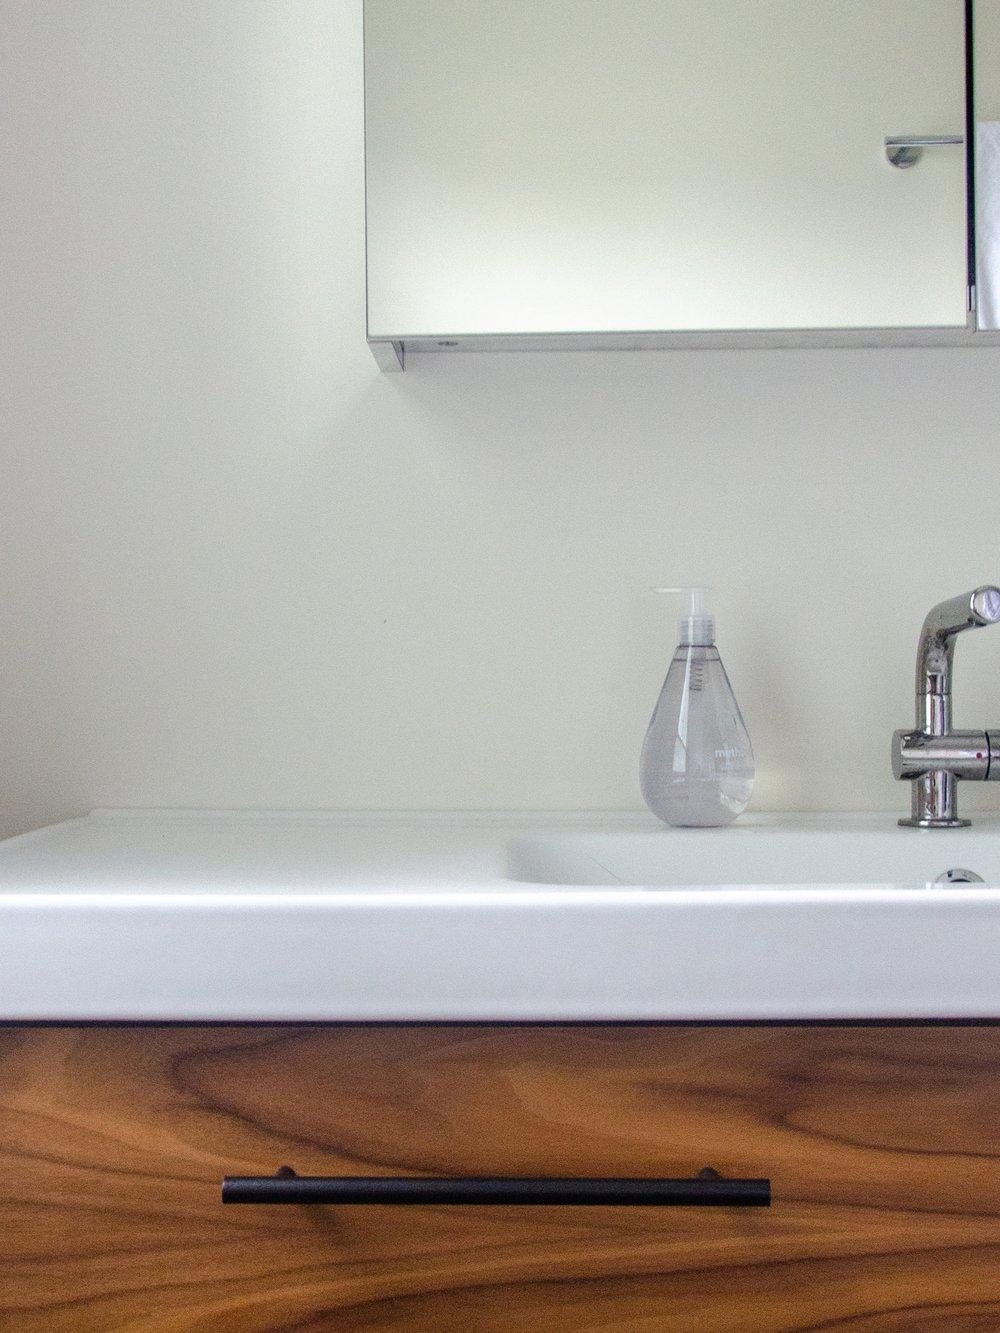 Ikea Godmorgon Bathroom Vanity and Mirror: Our Review — Salt ...